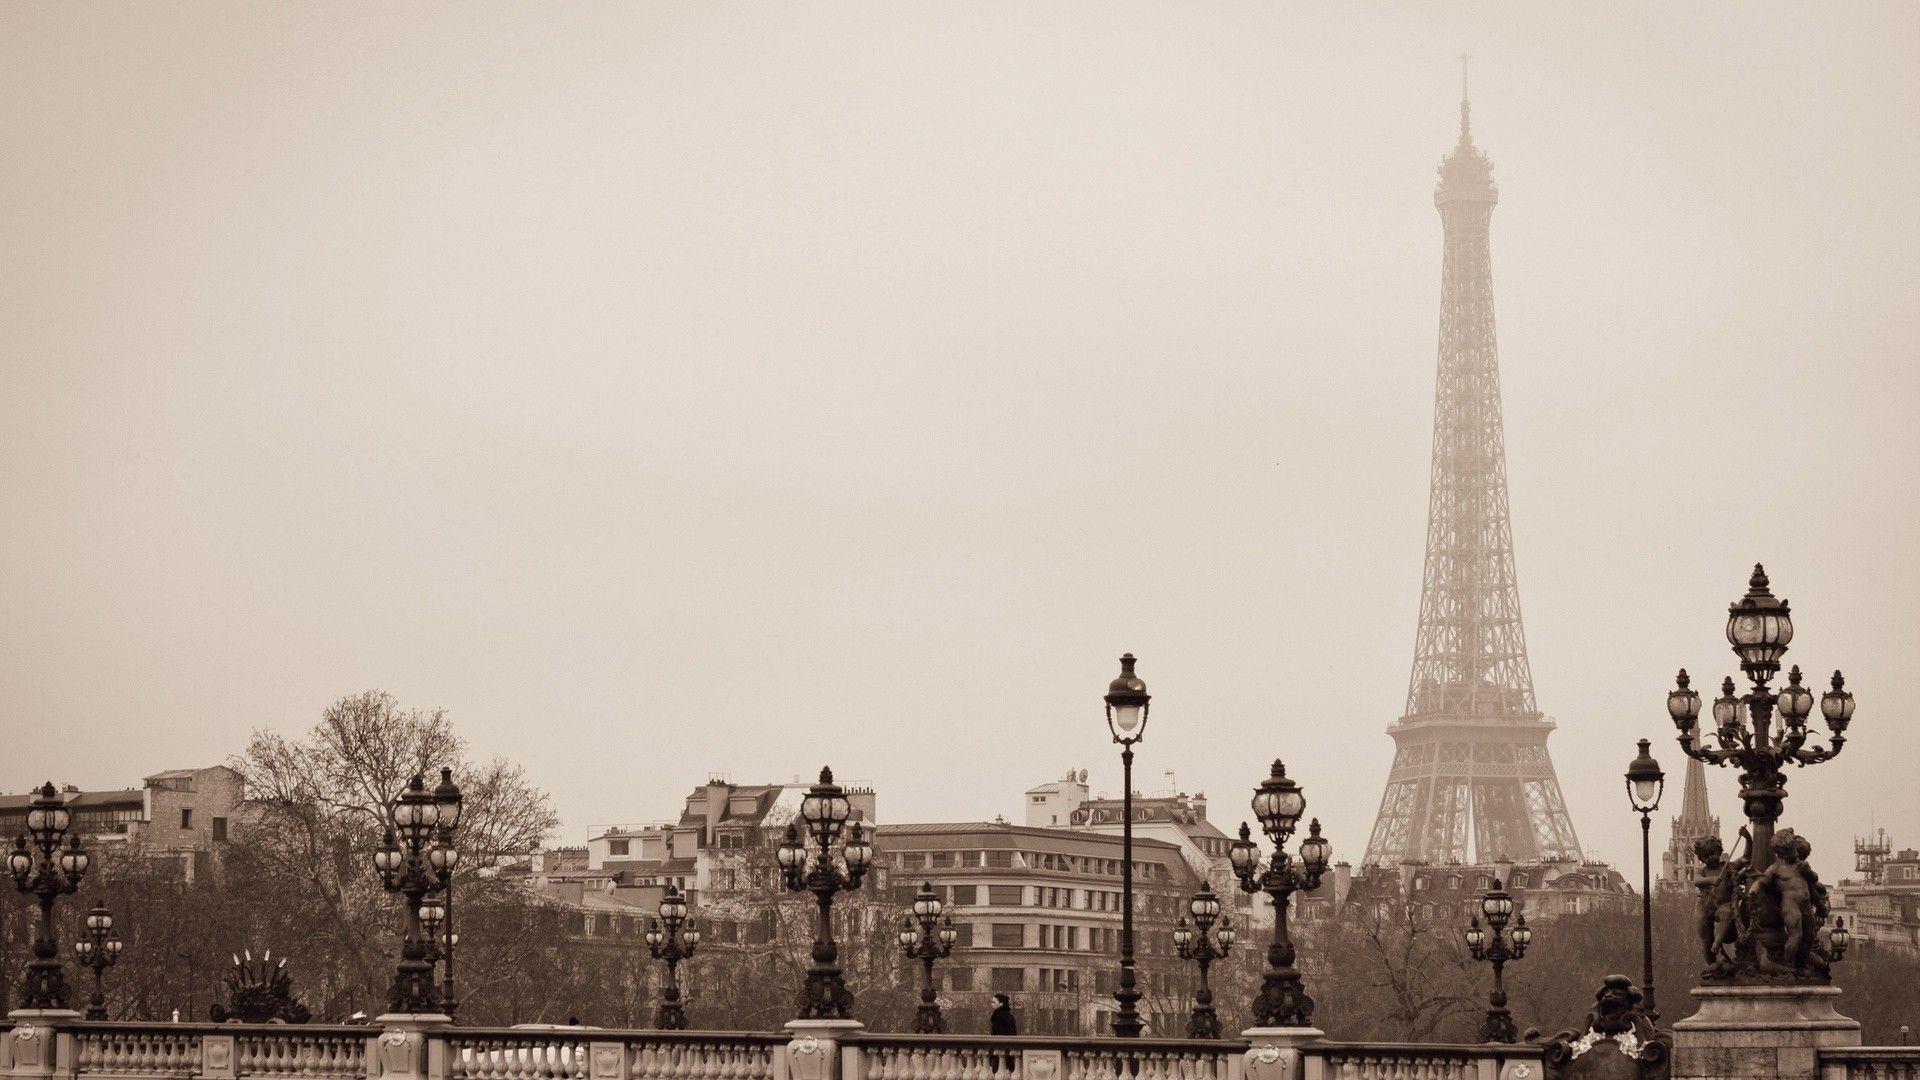 Black And White Paris Wallpapers Desktop For Desktop